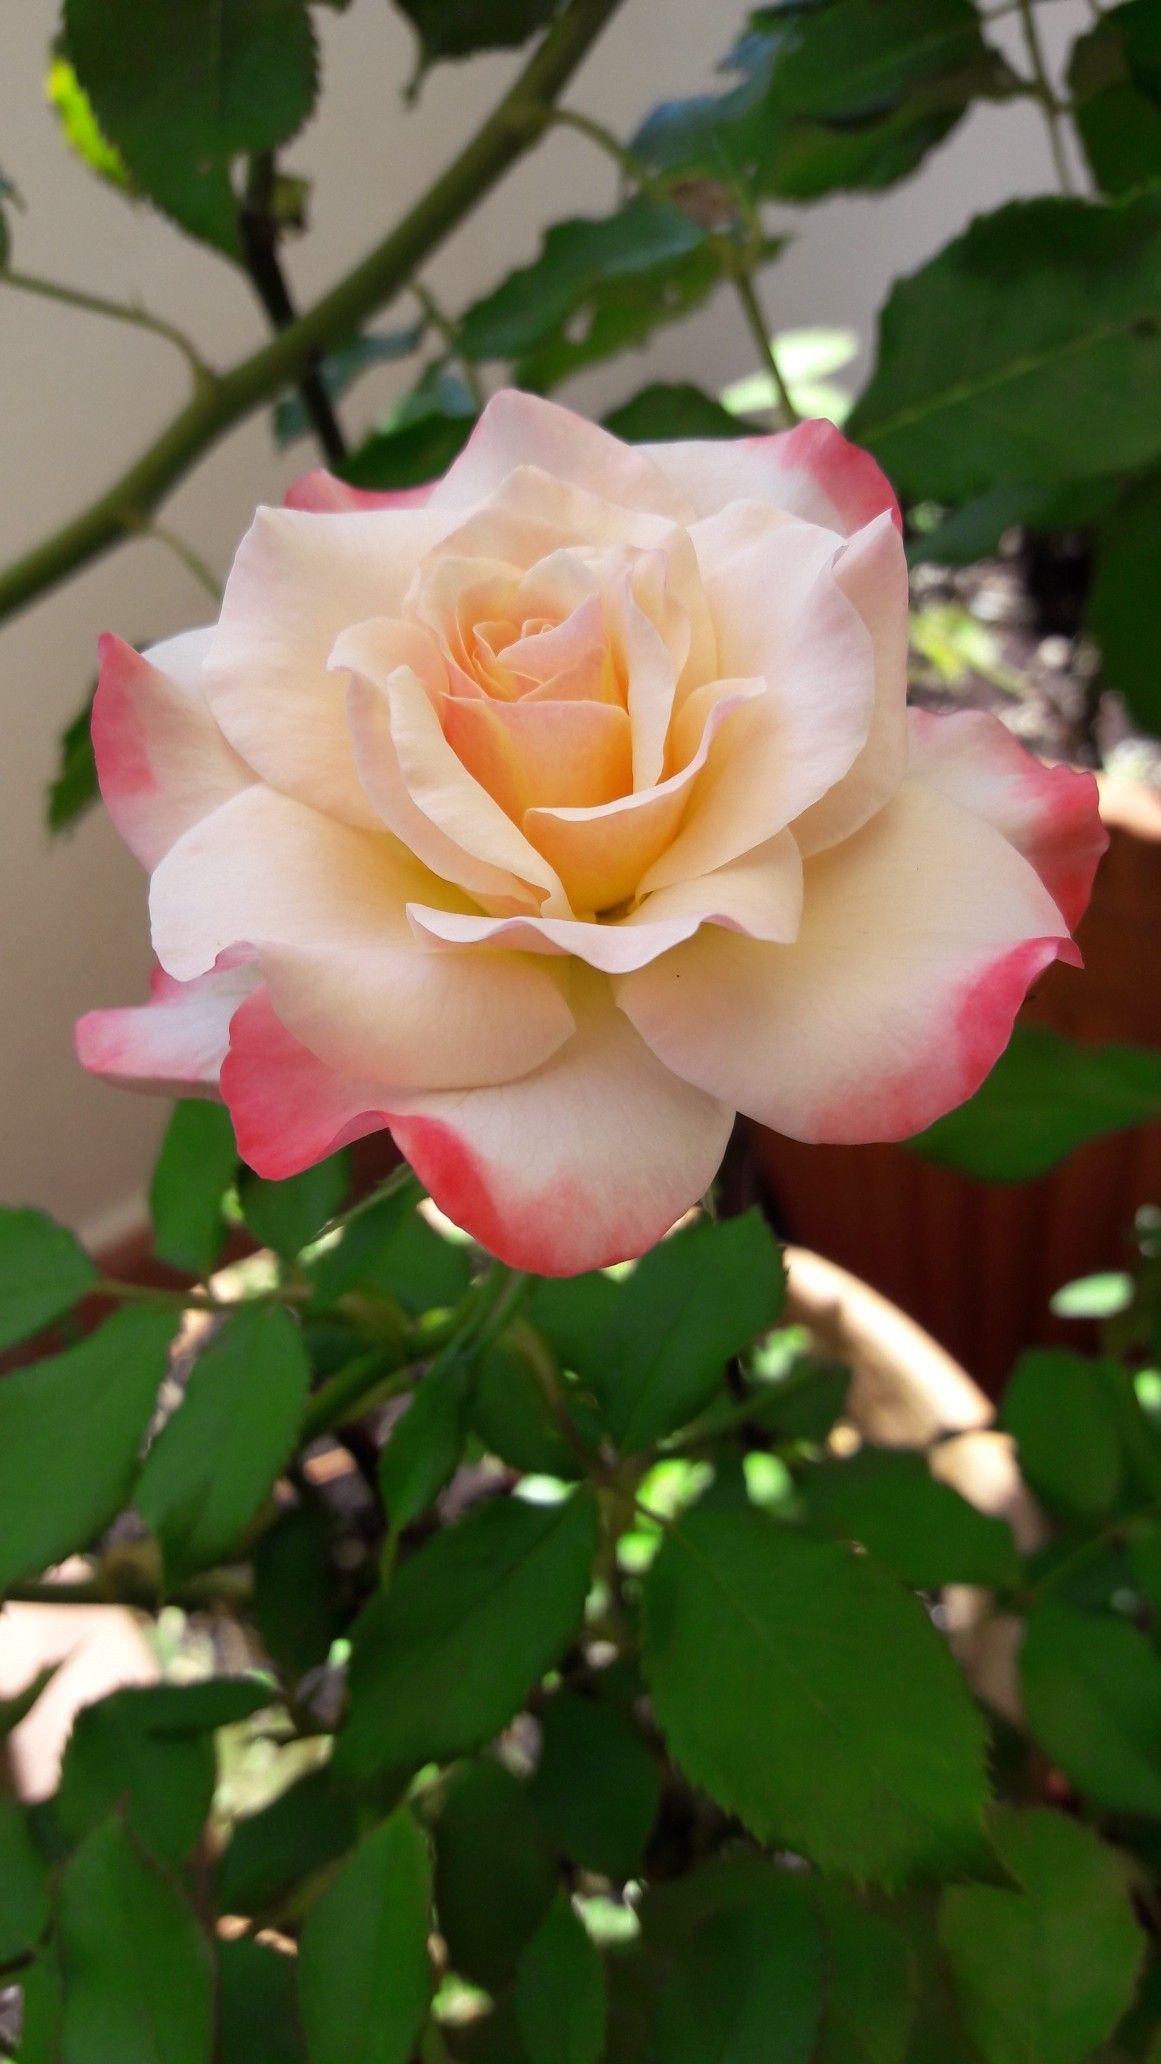 Roses In Garden: Pin By Mary Gallant Webb On Garden